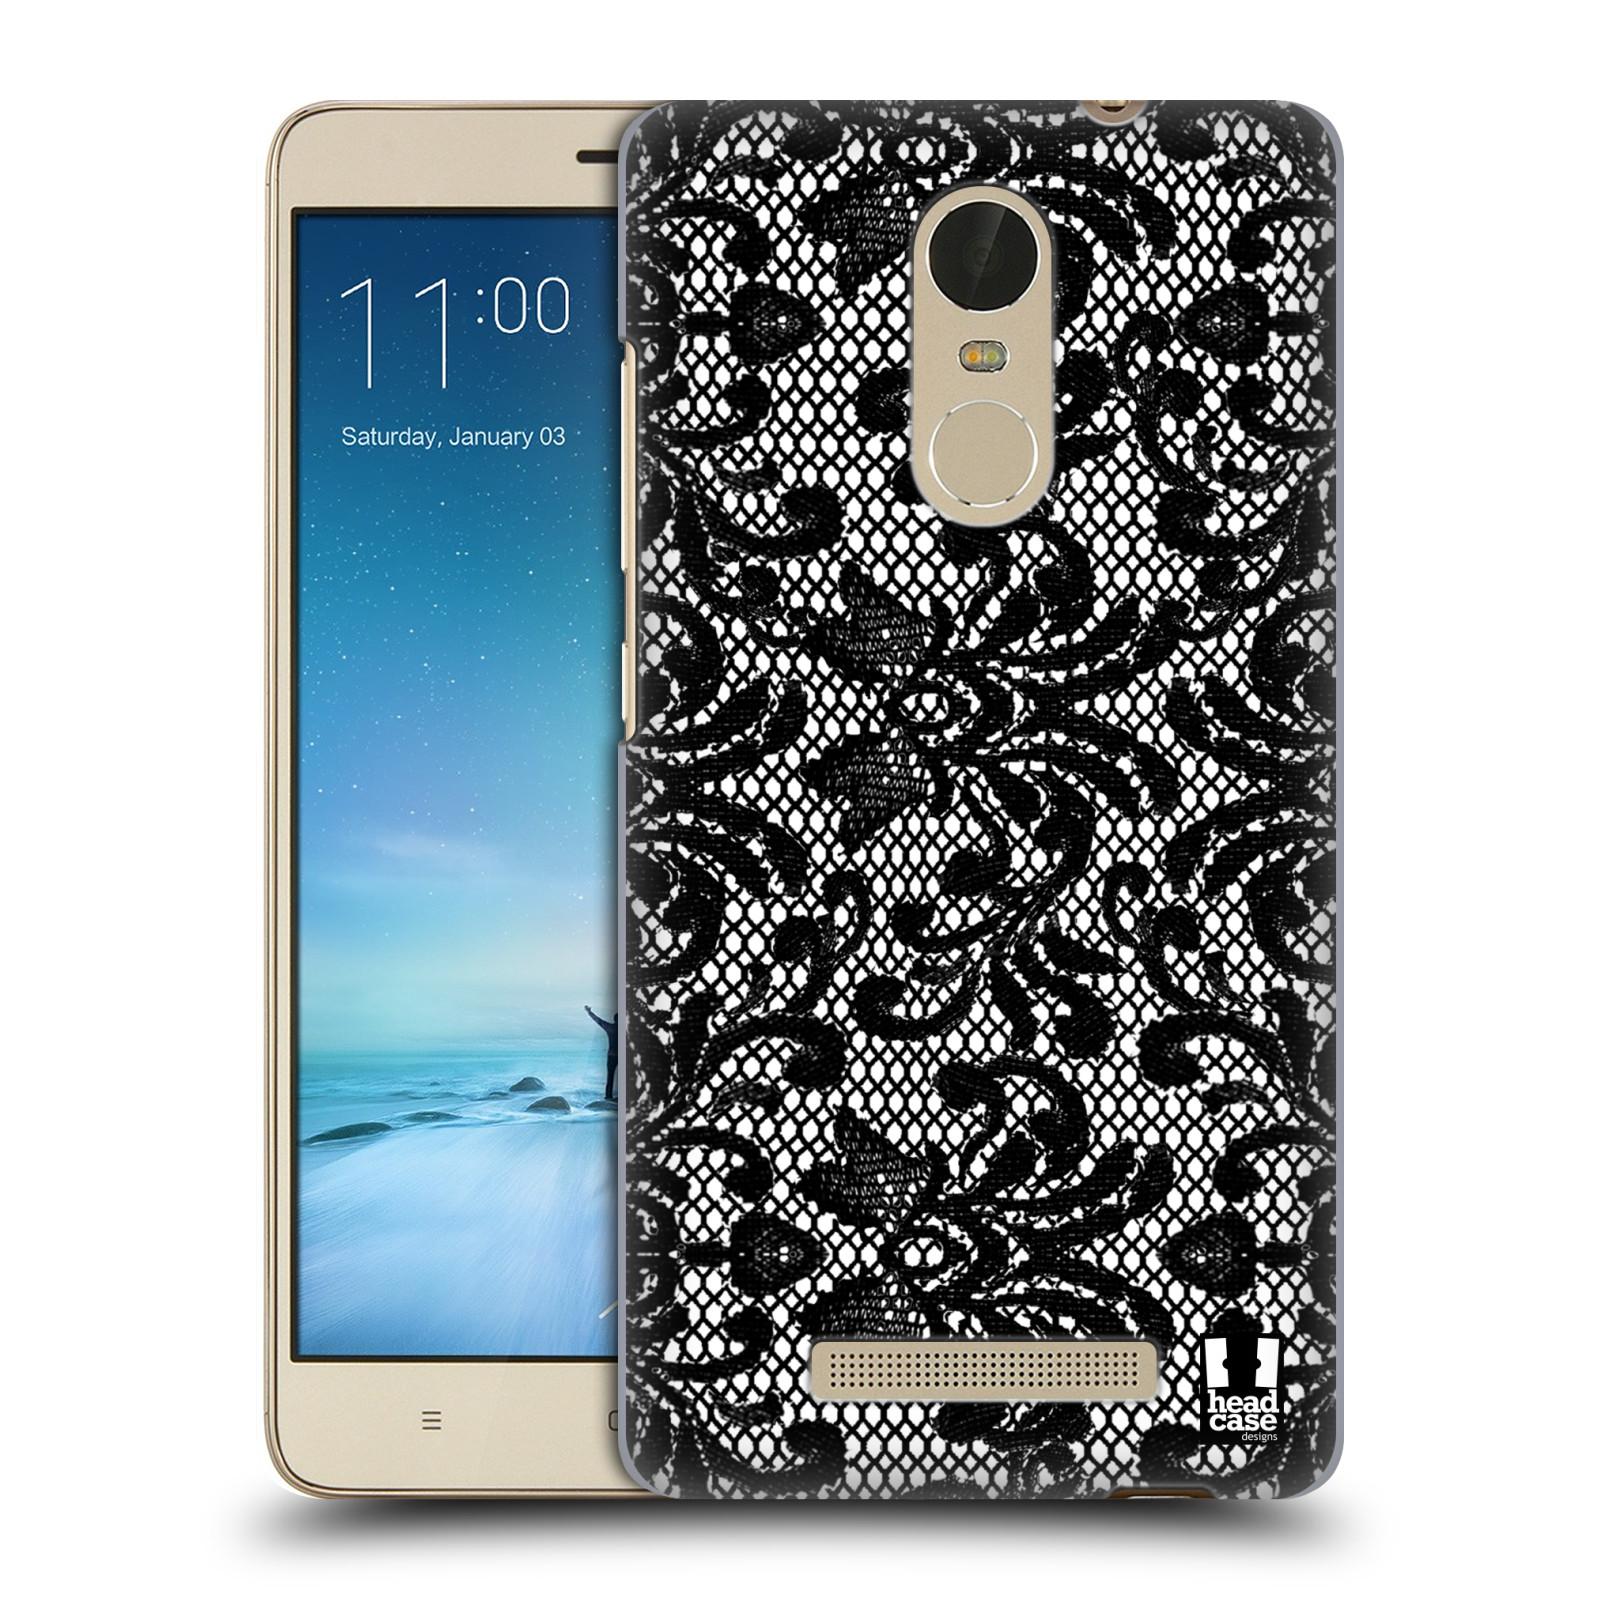 "Plastové pouzdro na mobil Xiaomi Redmi Note 3 HEAD CASE Krajka (Kryt či obal na mobilní telefon Xiaomi Redmi Note 3 s 5,5"" displejem)"